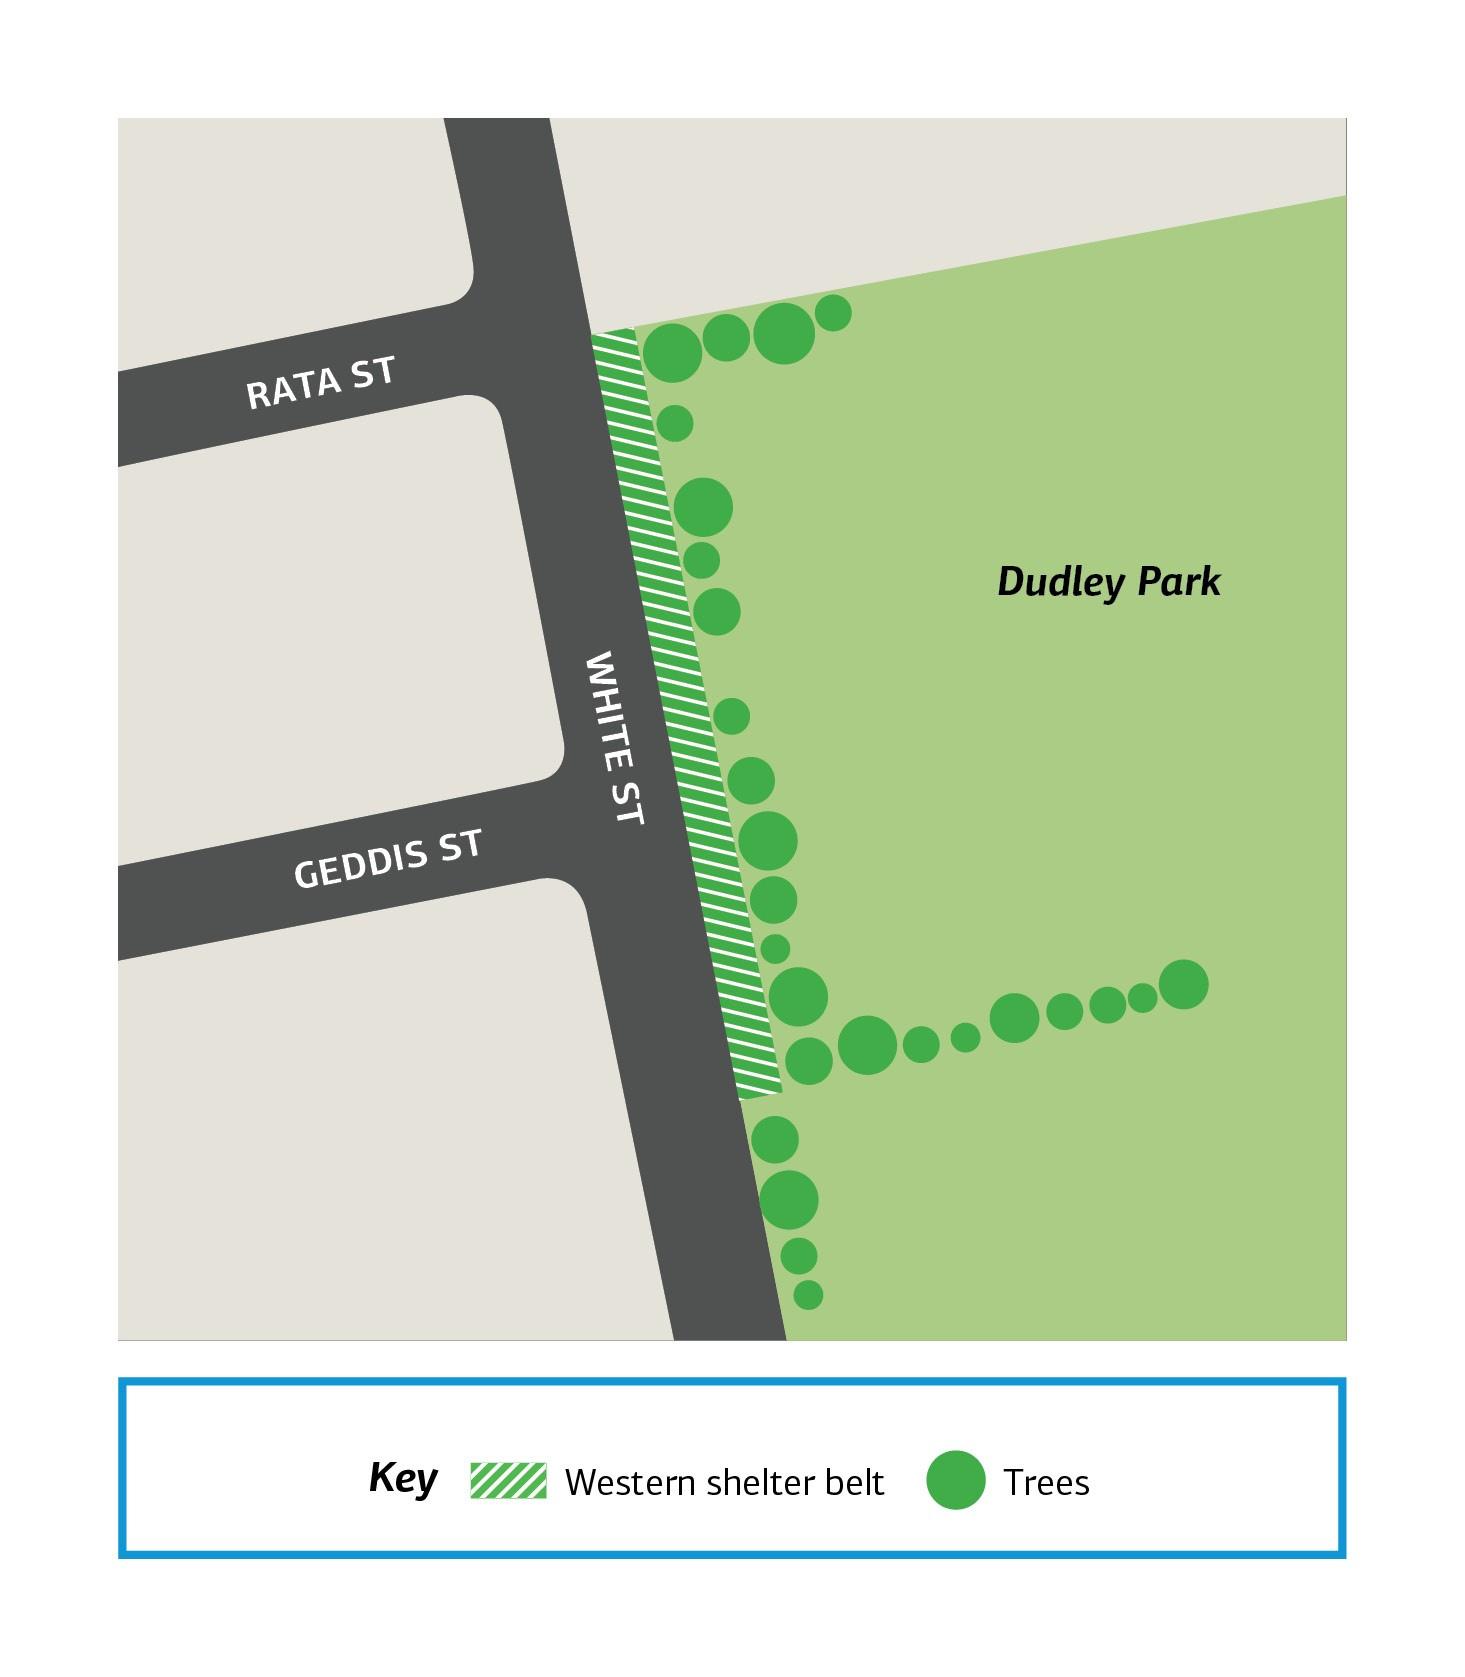 Stylised map showing location of shelter belt on White Street